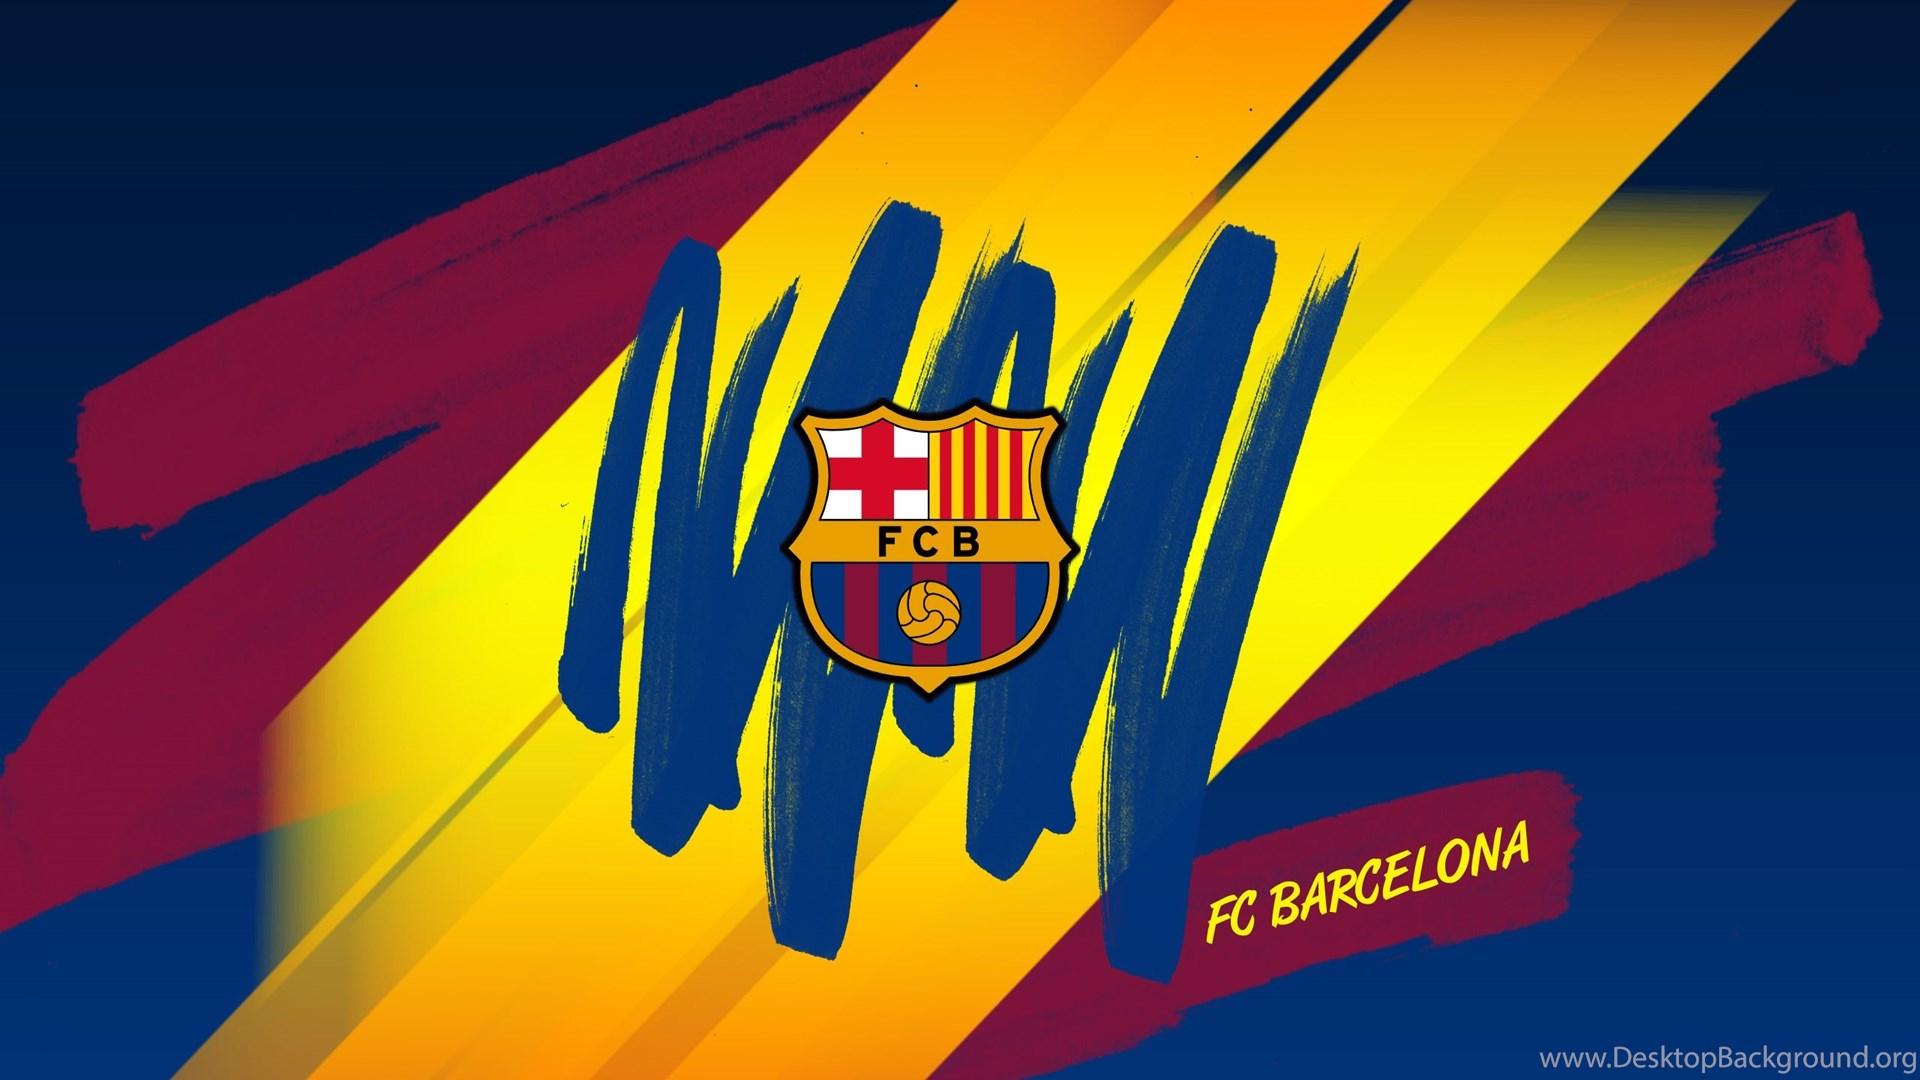 Barcelona Fc Logo Hd Wallpapers 4k Wallpapers Desktop Background